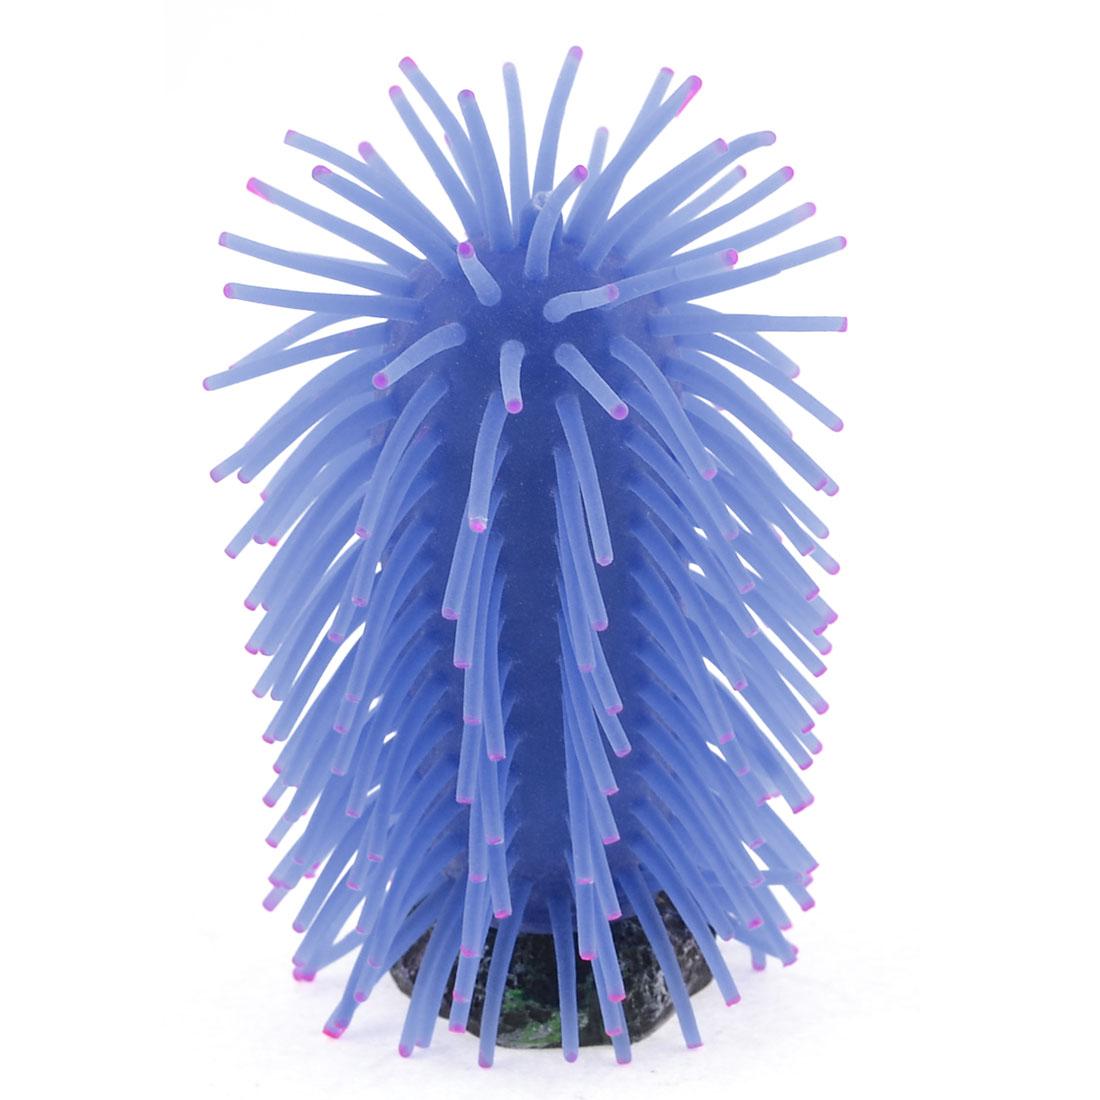 Fish Tank Manmade Fuchsia Dot Blue Soft Silicone Coral Anemone Ornament